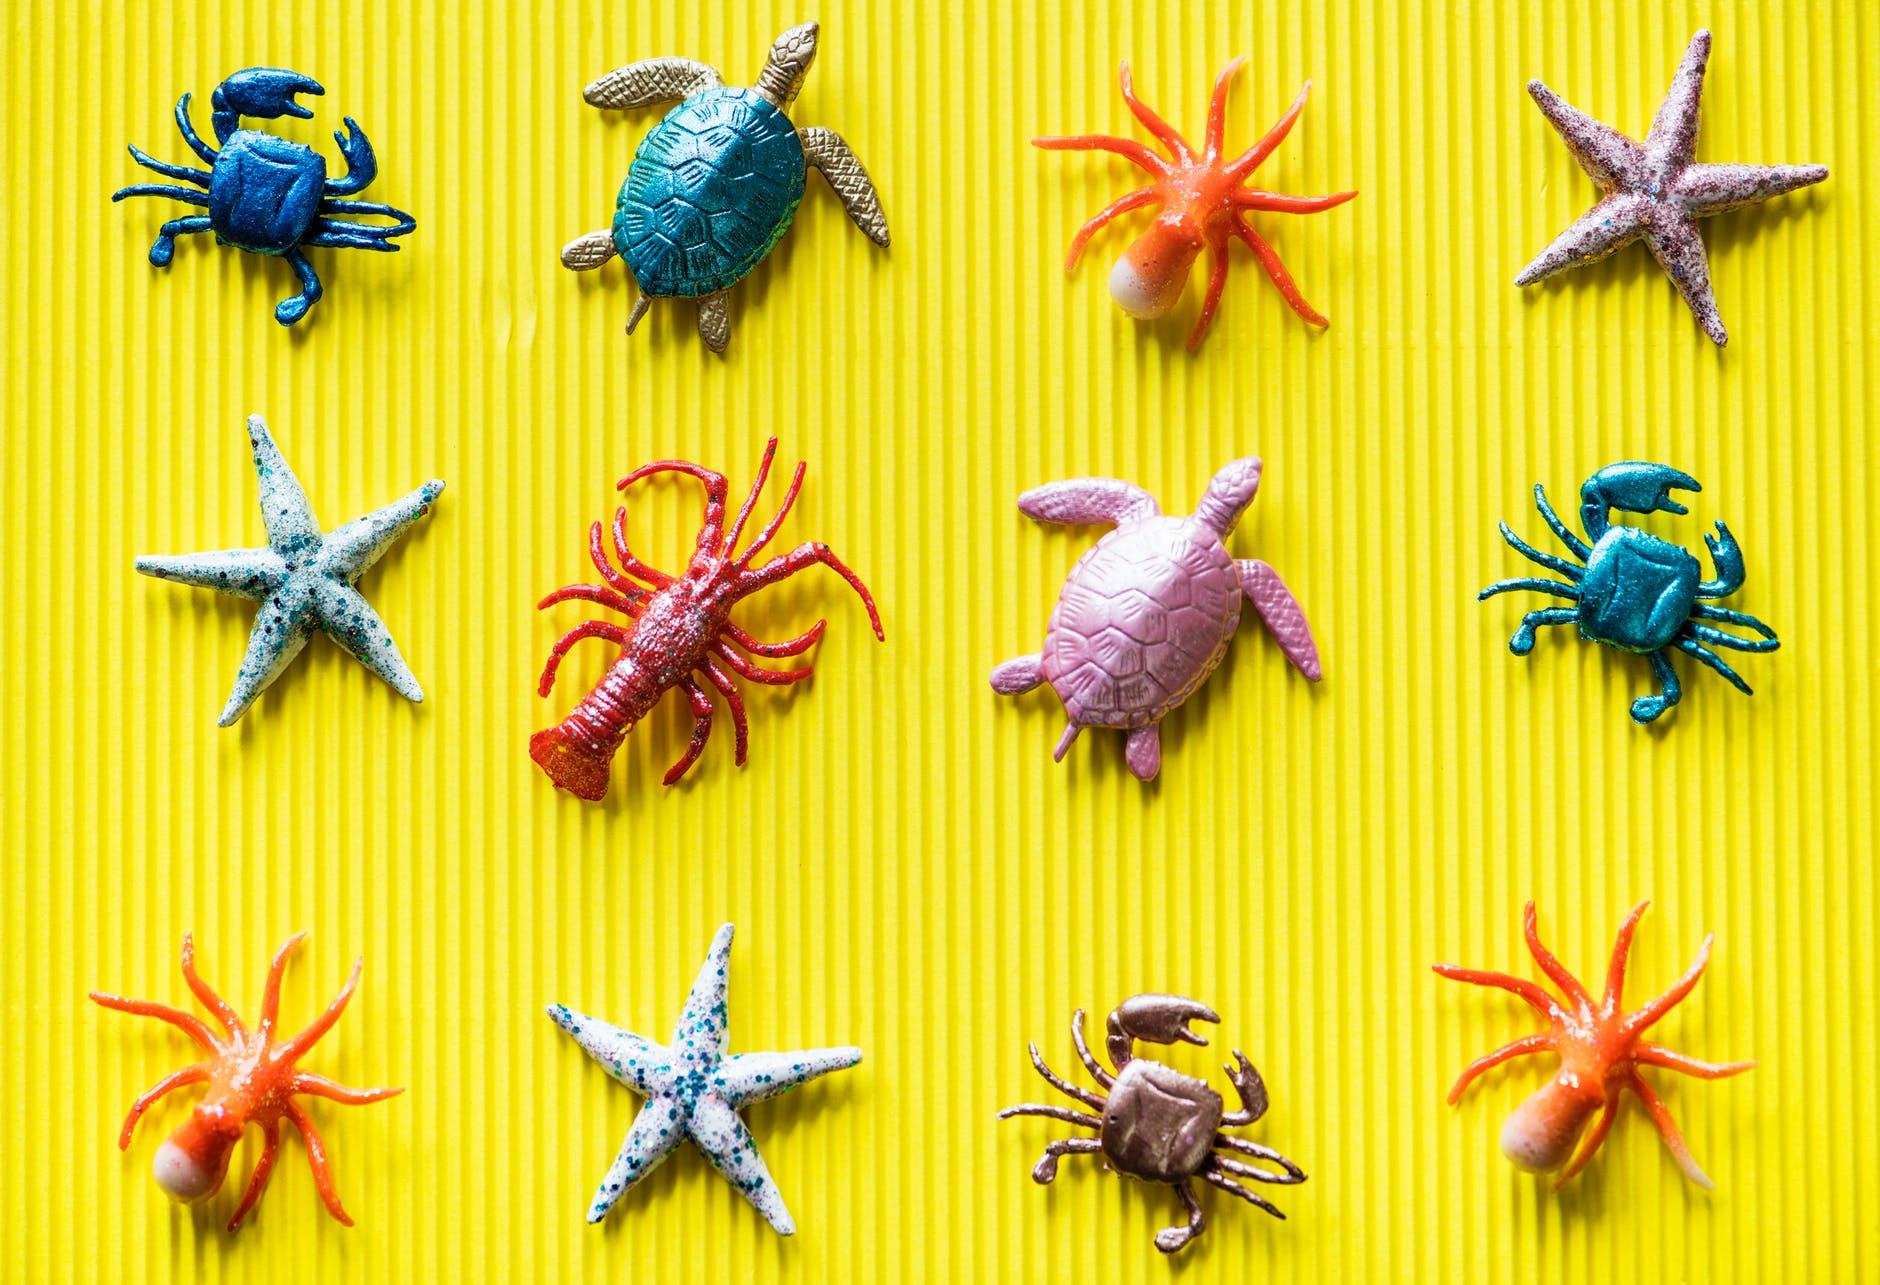 assorted underwater animal toys